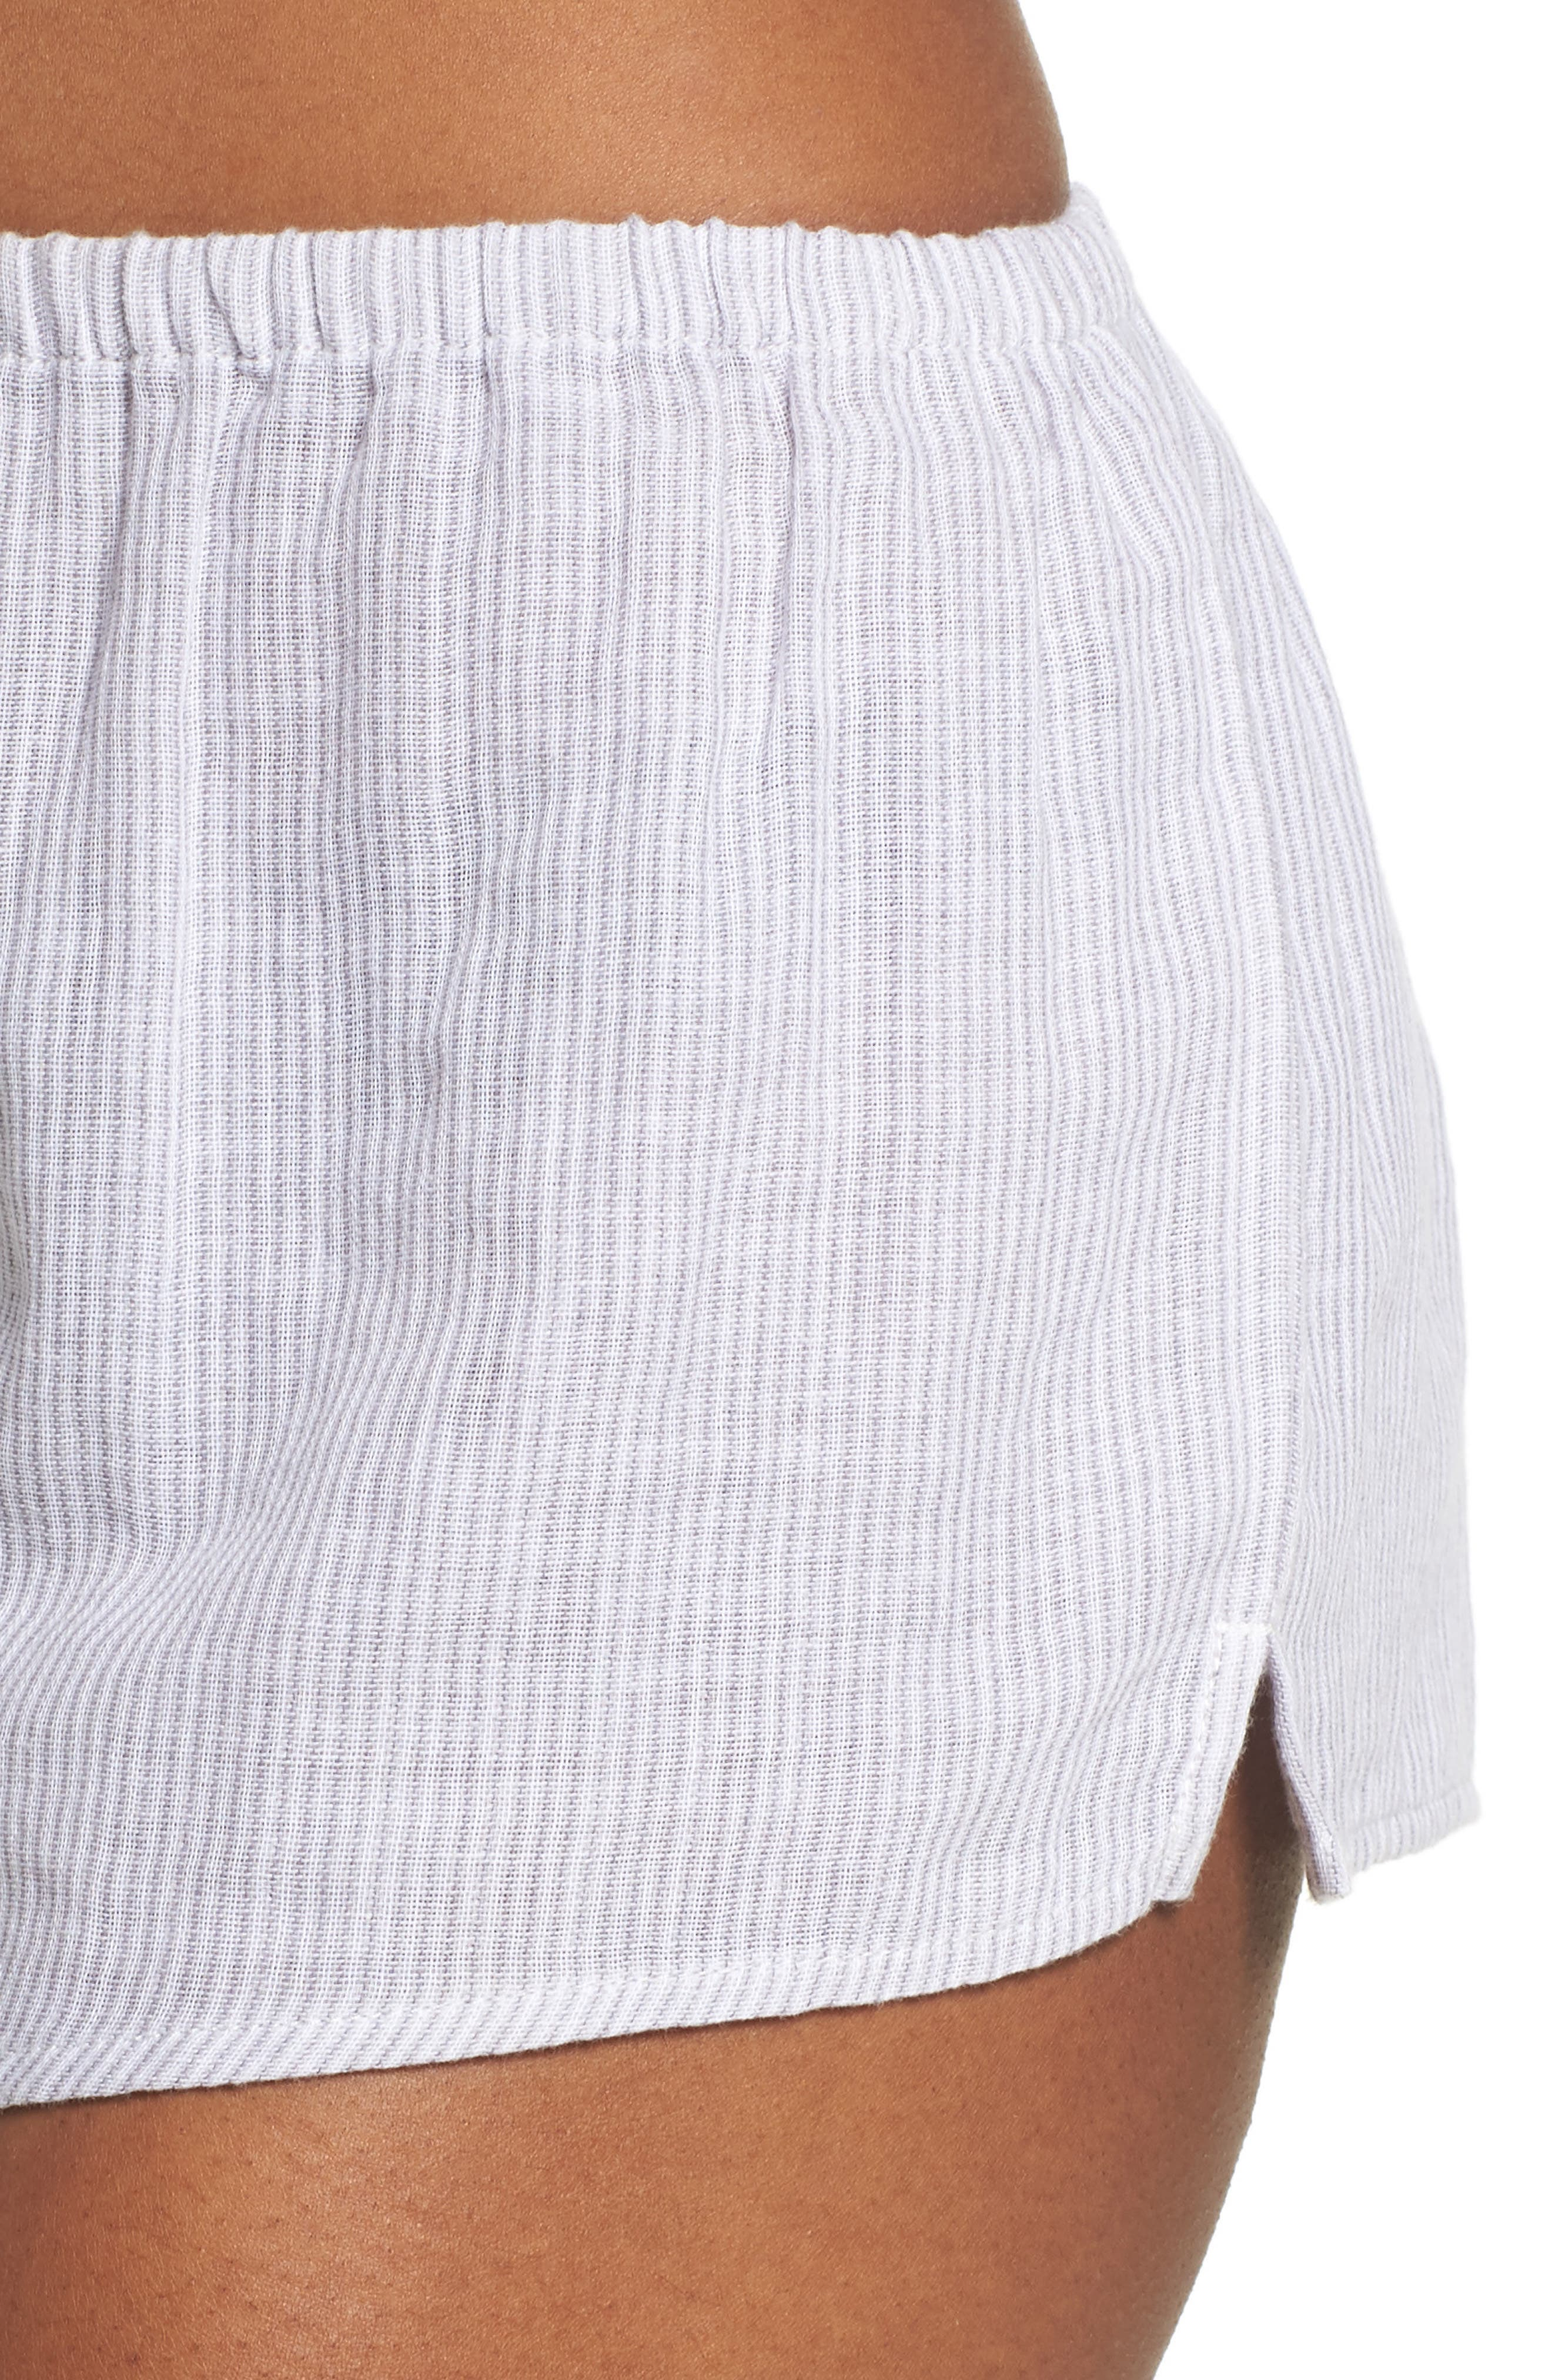 Stripe Pajama Shorts,                             Alternate thumbnail 6, color,                             Grey/ White